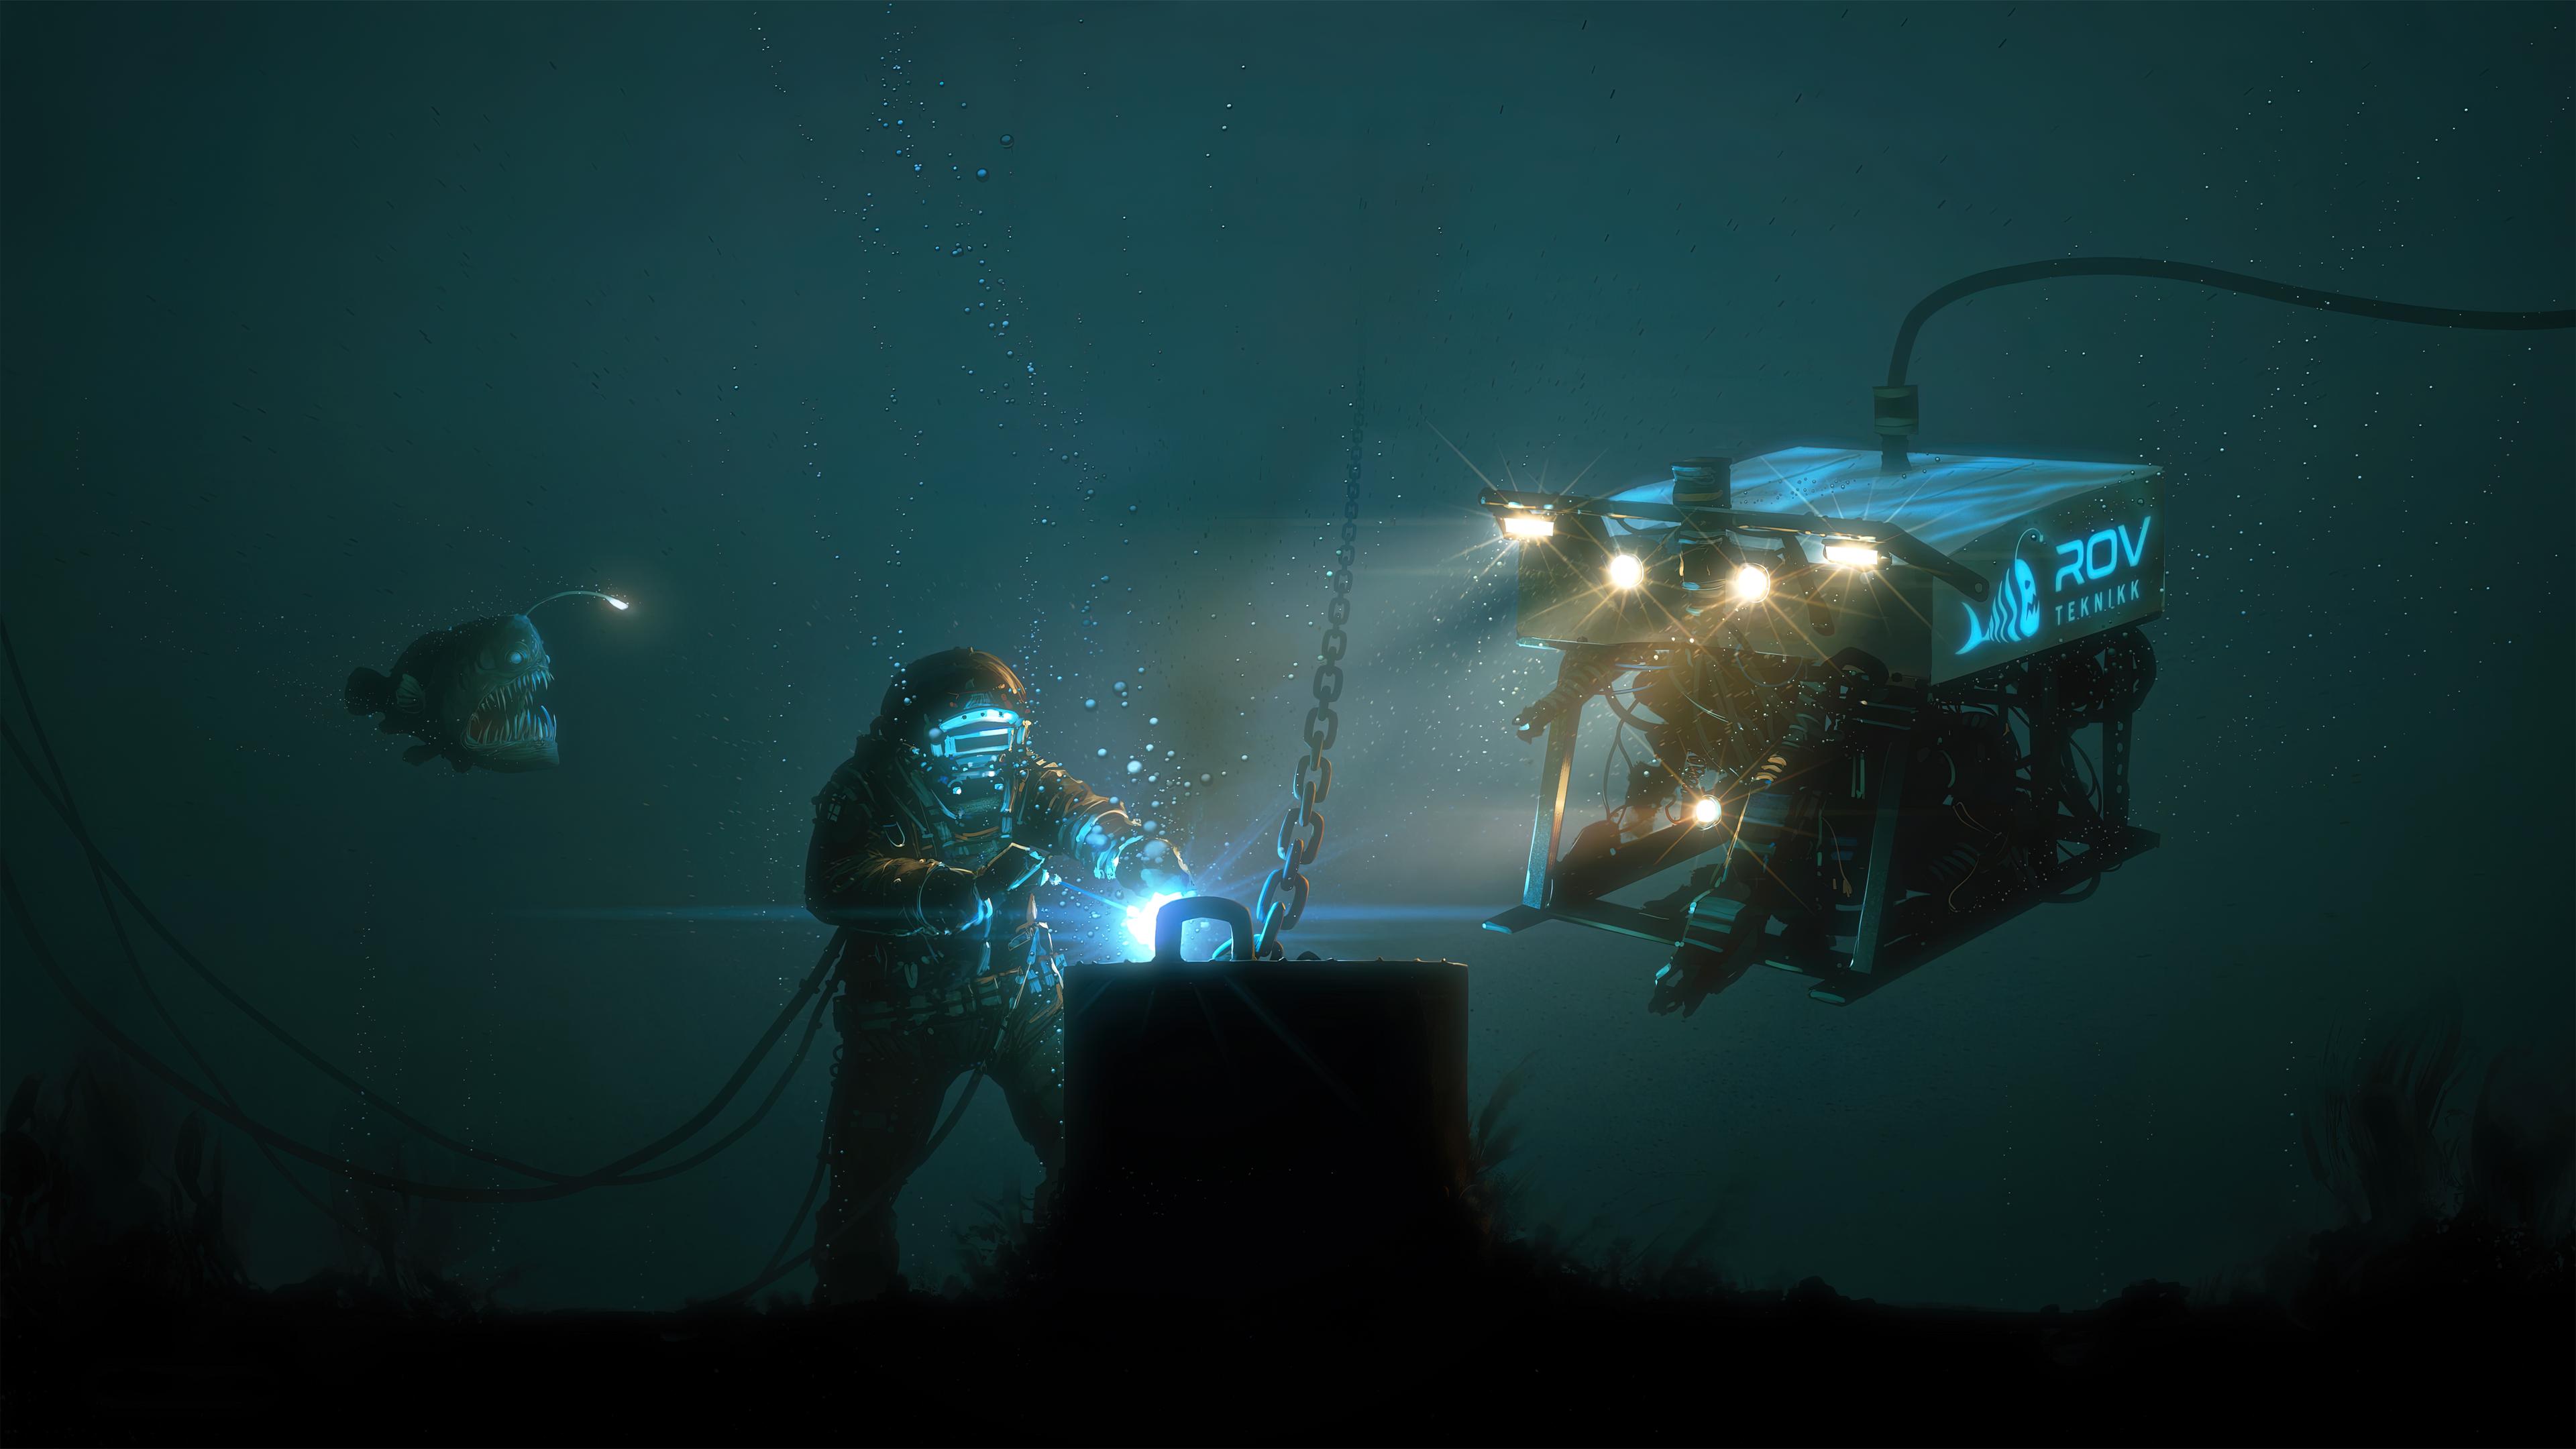 General 3840x2160 welding technology deep sea diving robot frogfish digital art digital underwater